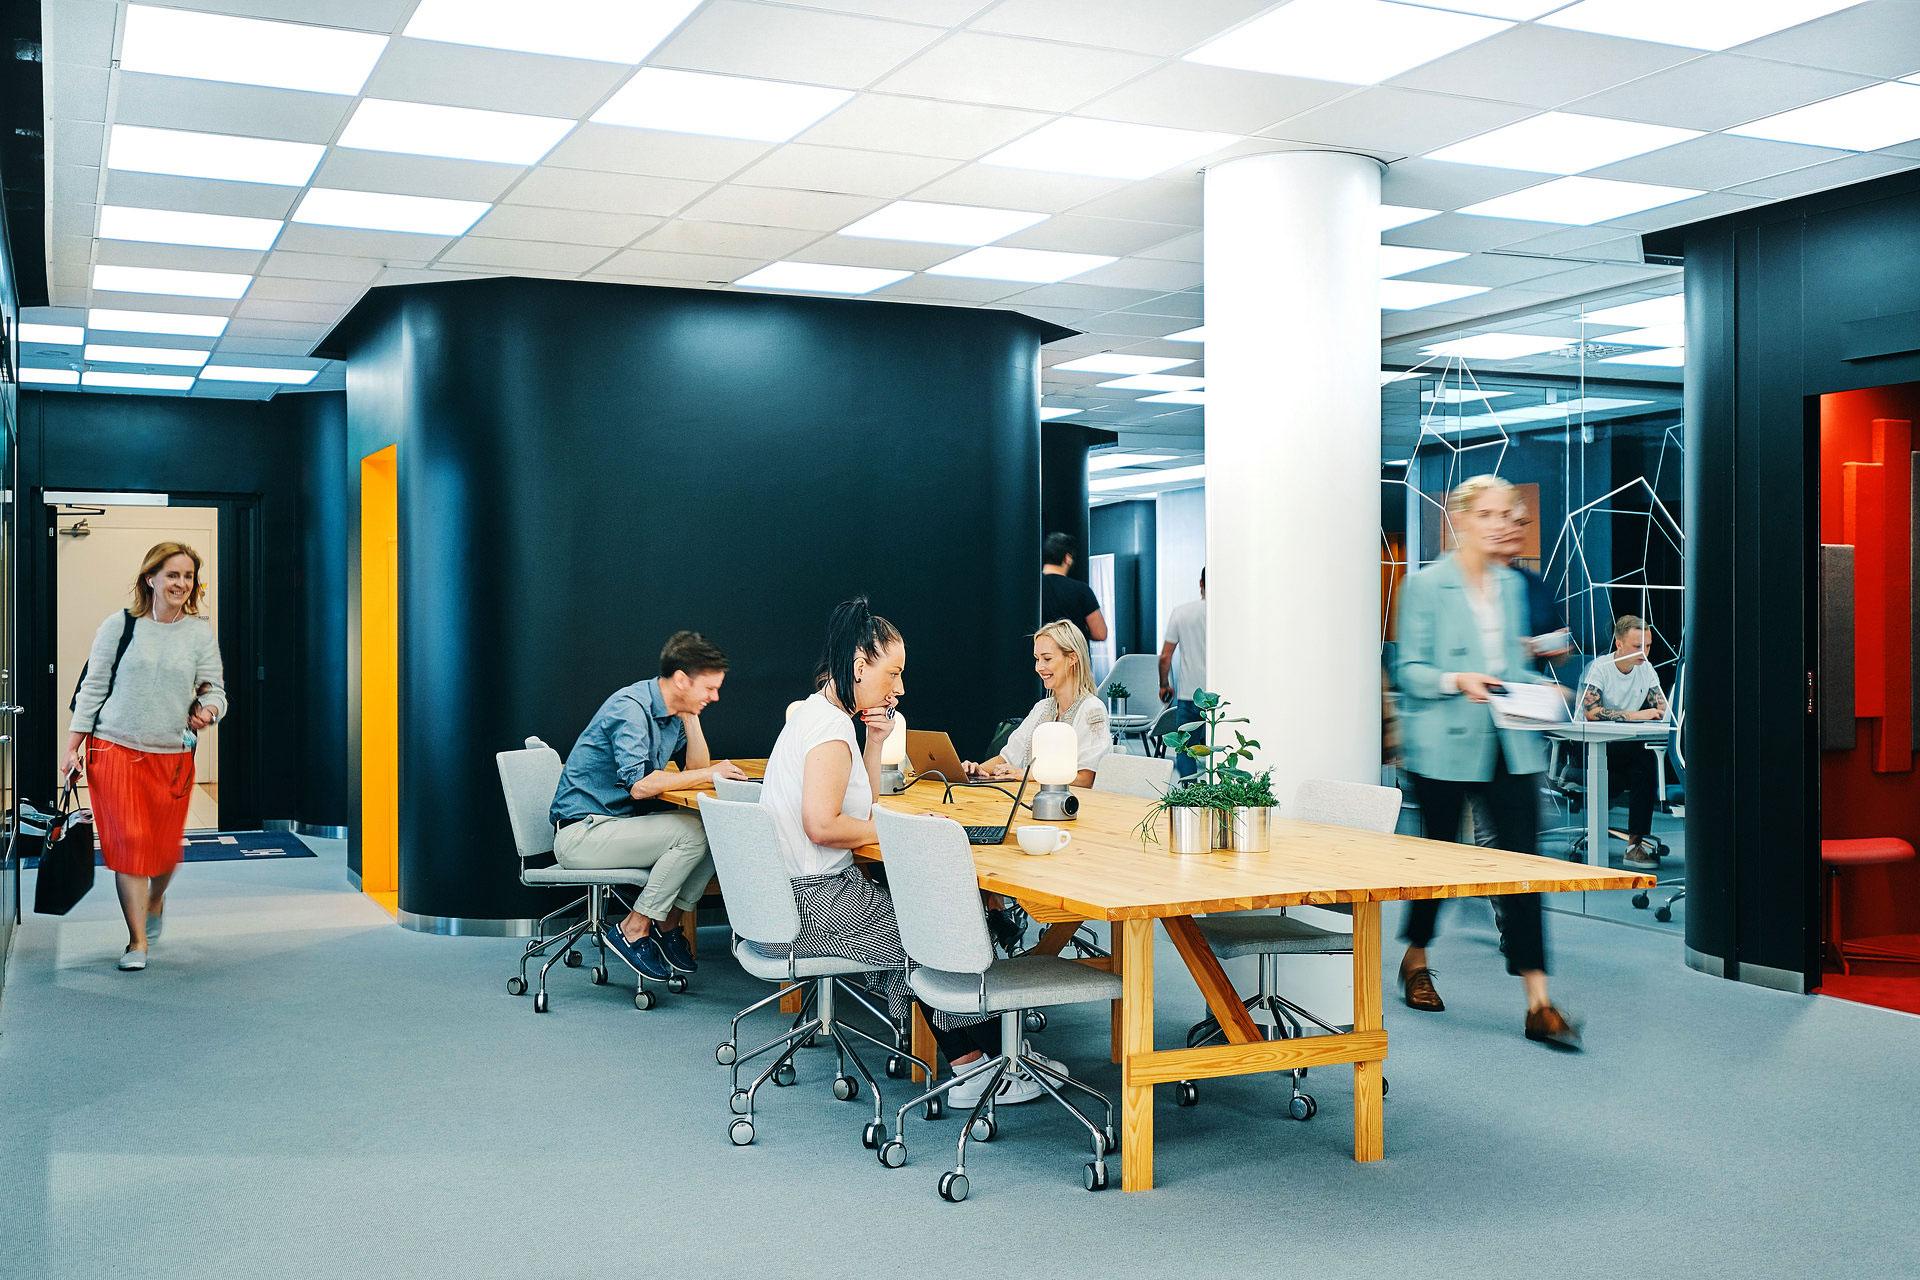 Coworking Flex medlemskap hos expectrum i Västerås. Fotogragf: Af Adam